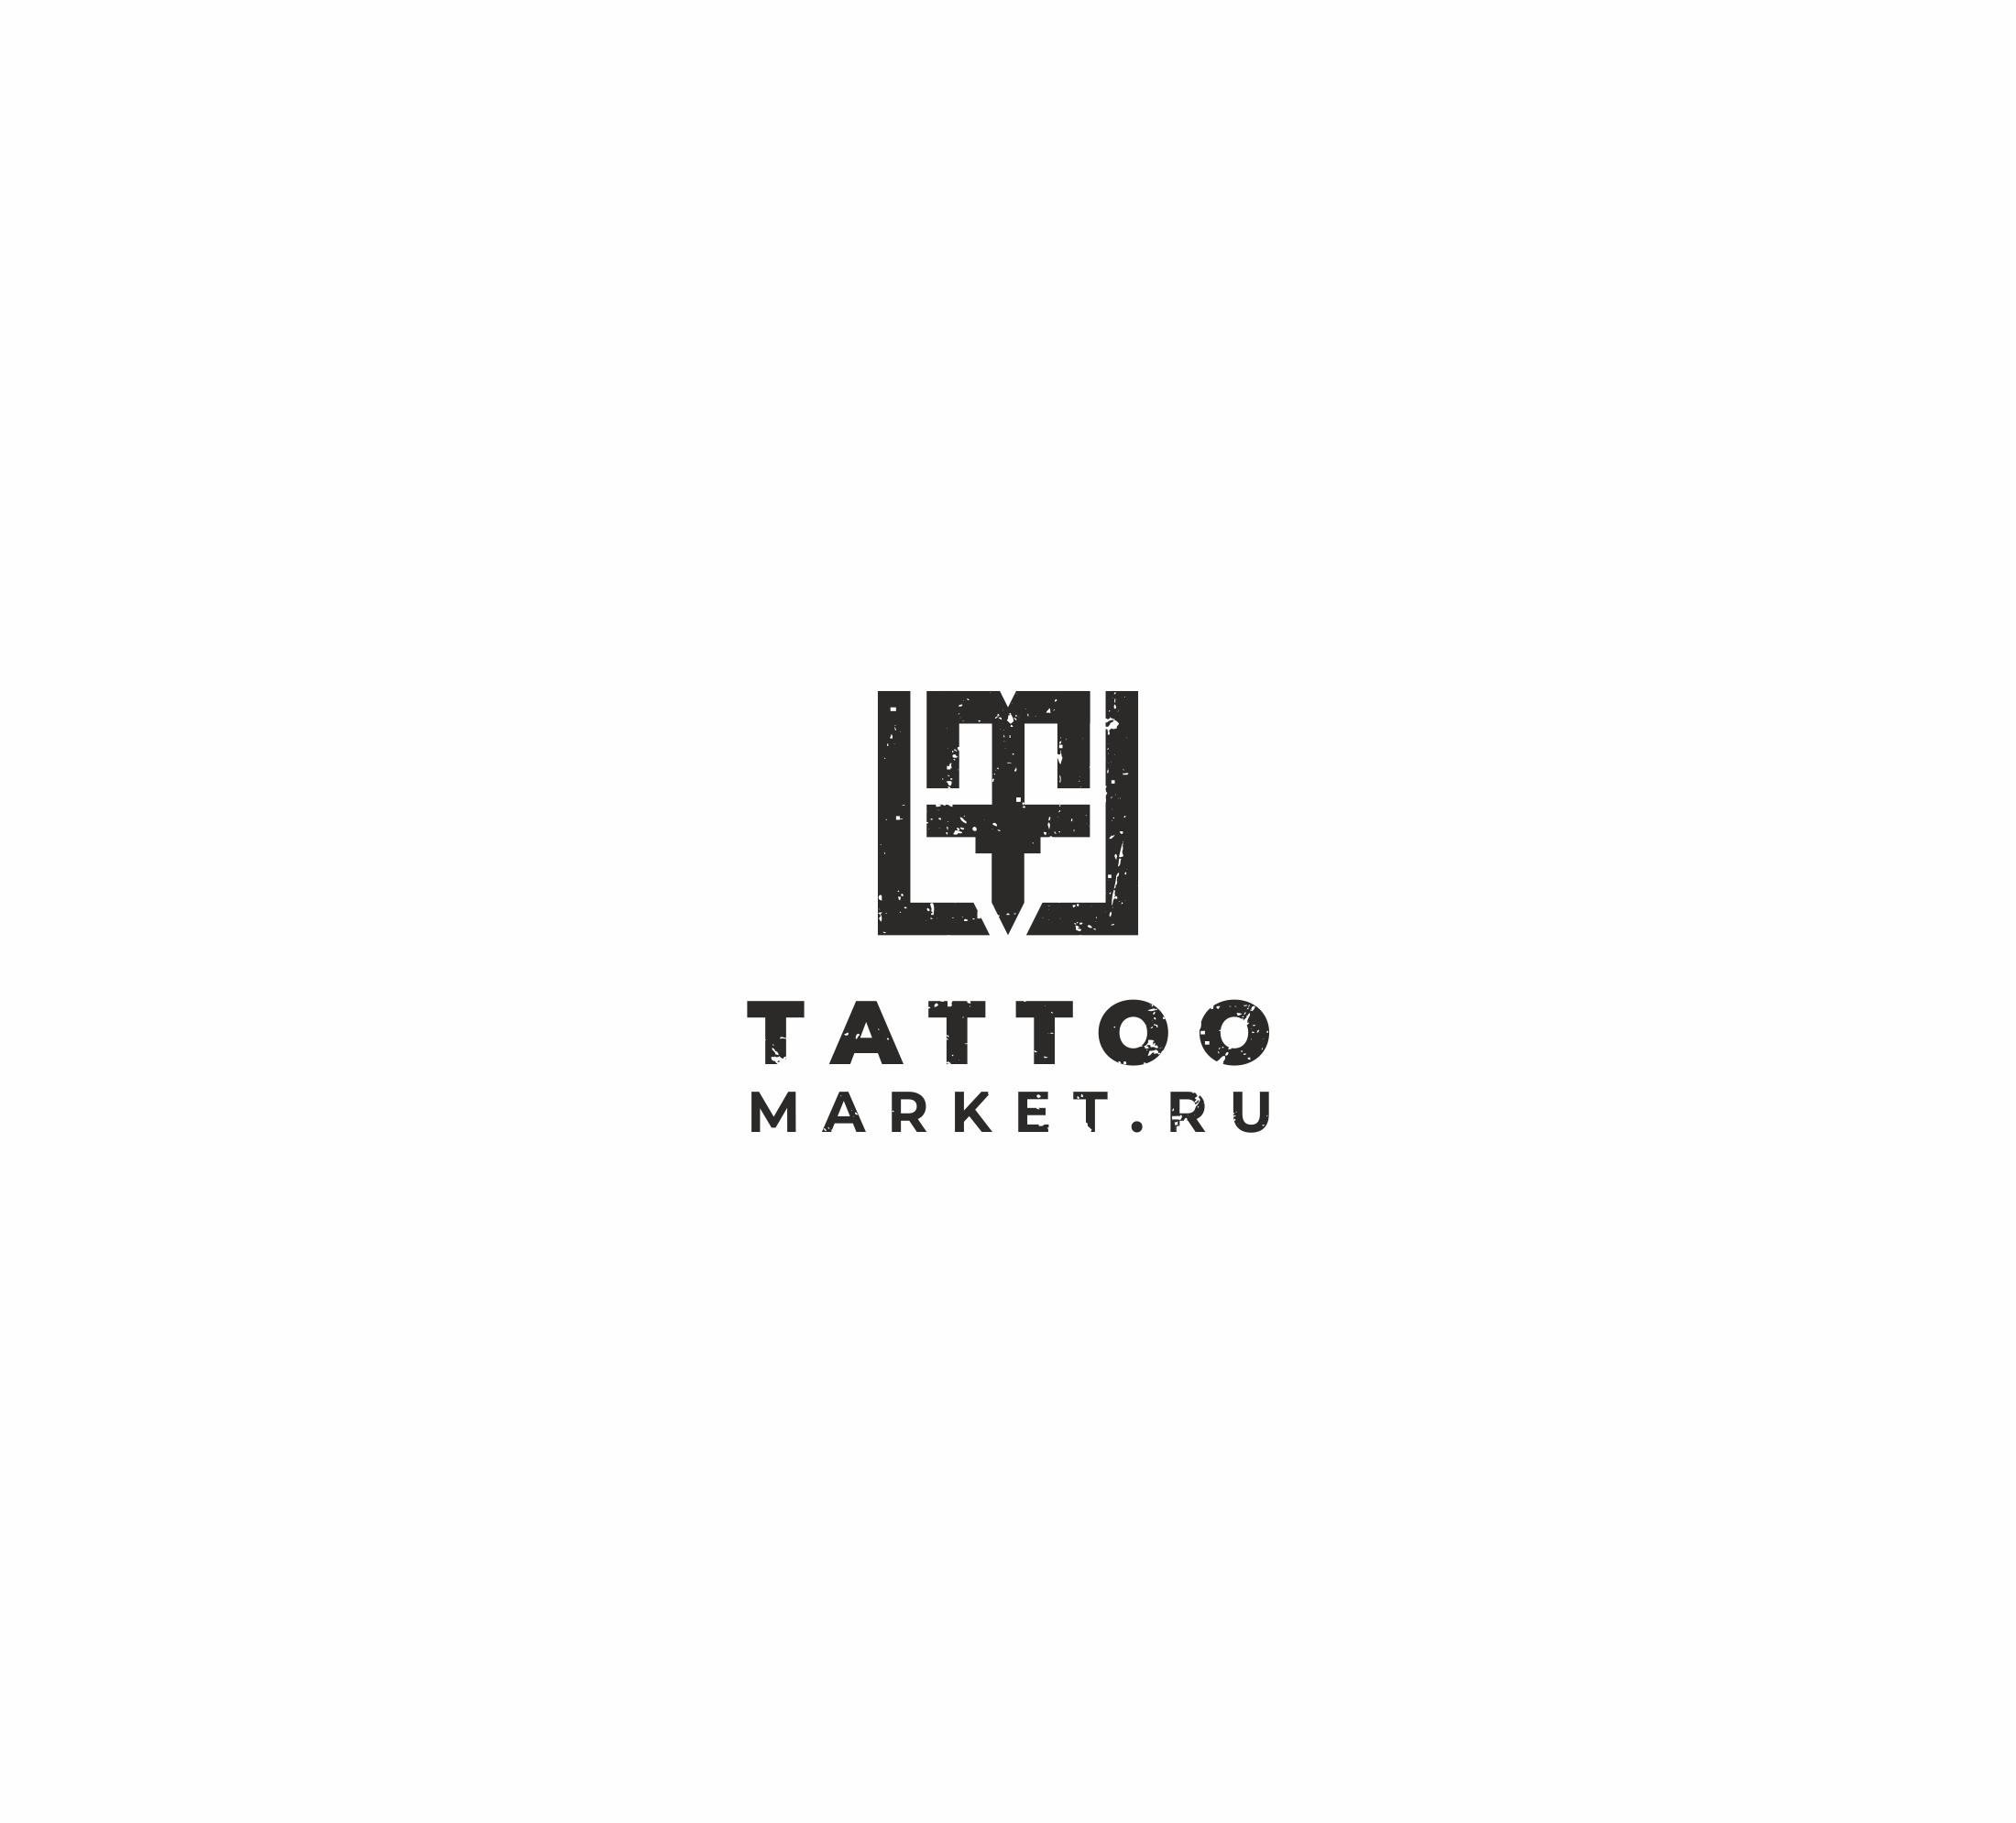 Редизайн логотипа магазина тату оборудования TattooMarket.ru фото f_9485c3c370f98652.jpg